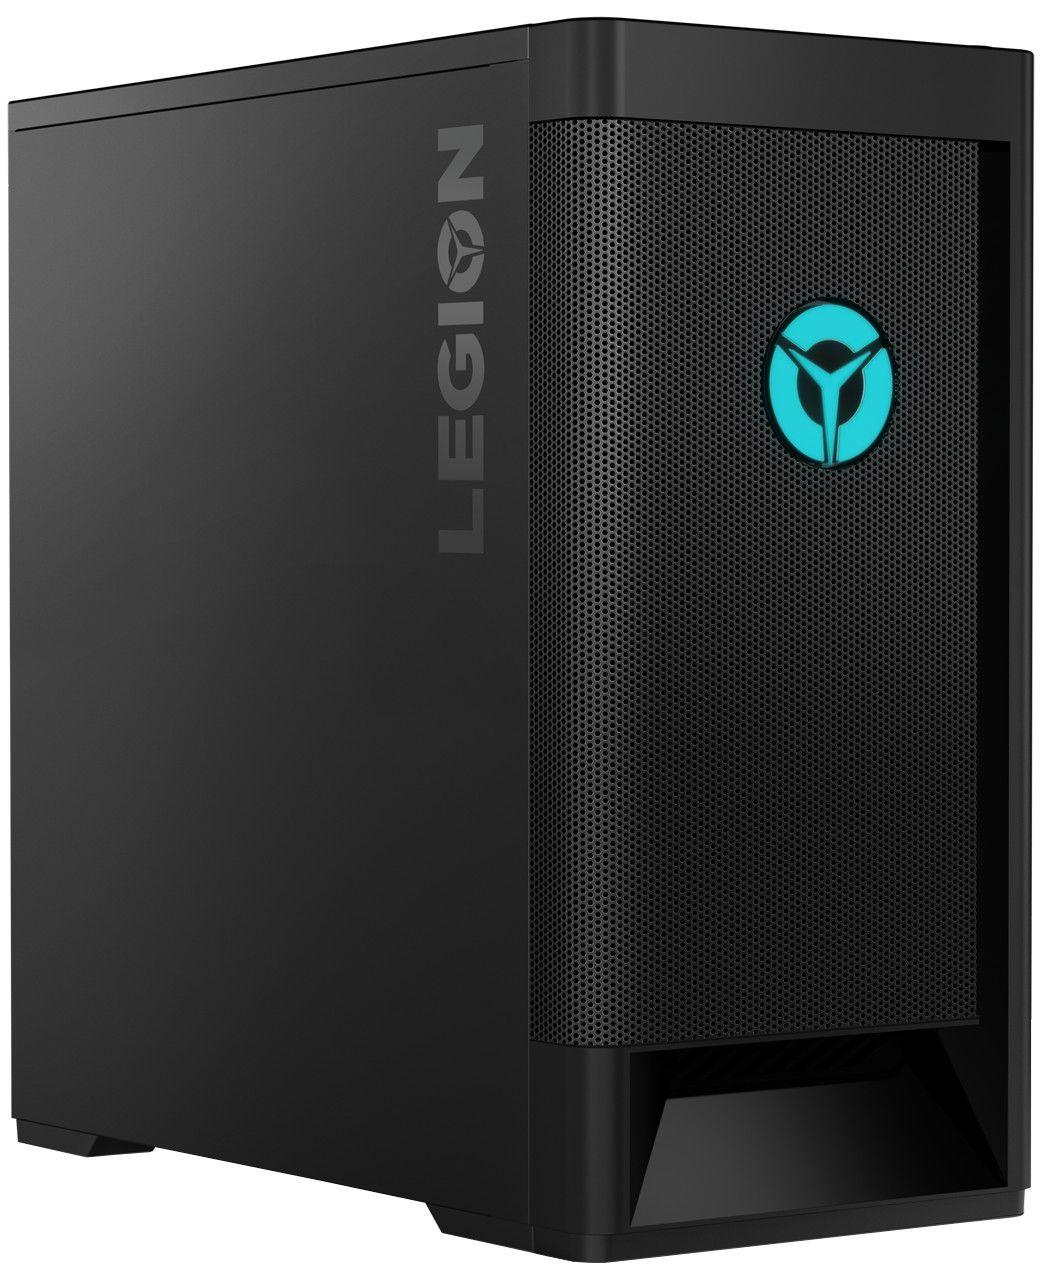 Lenovo Legion T5 Gaming PC (Ryzen 7 3700x, Nvidia Geforce RTX 3070)